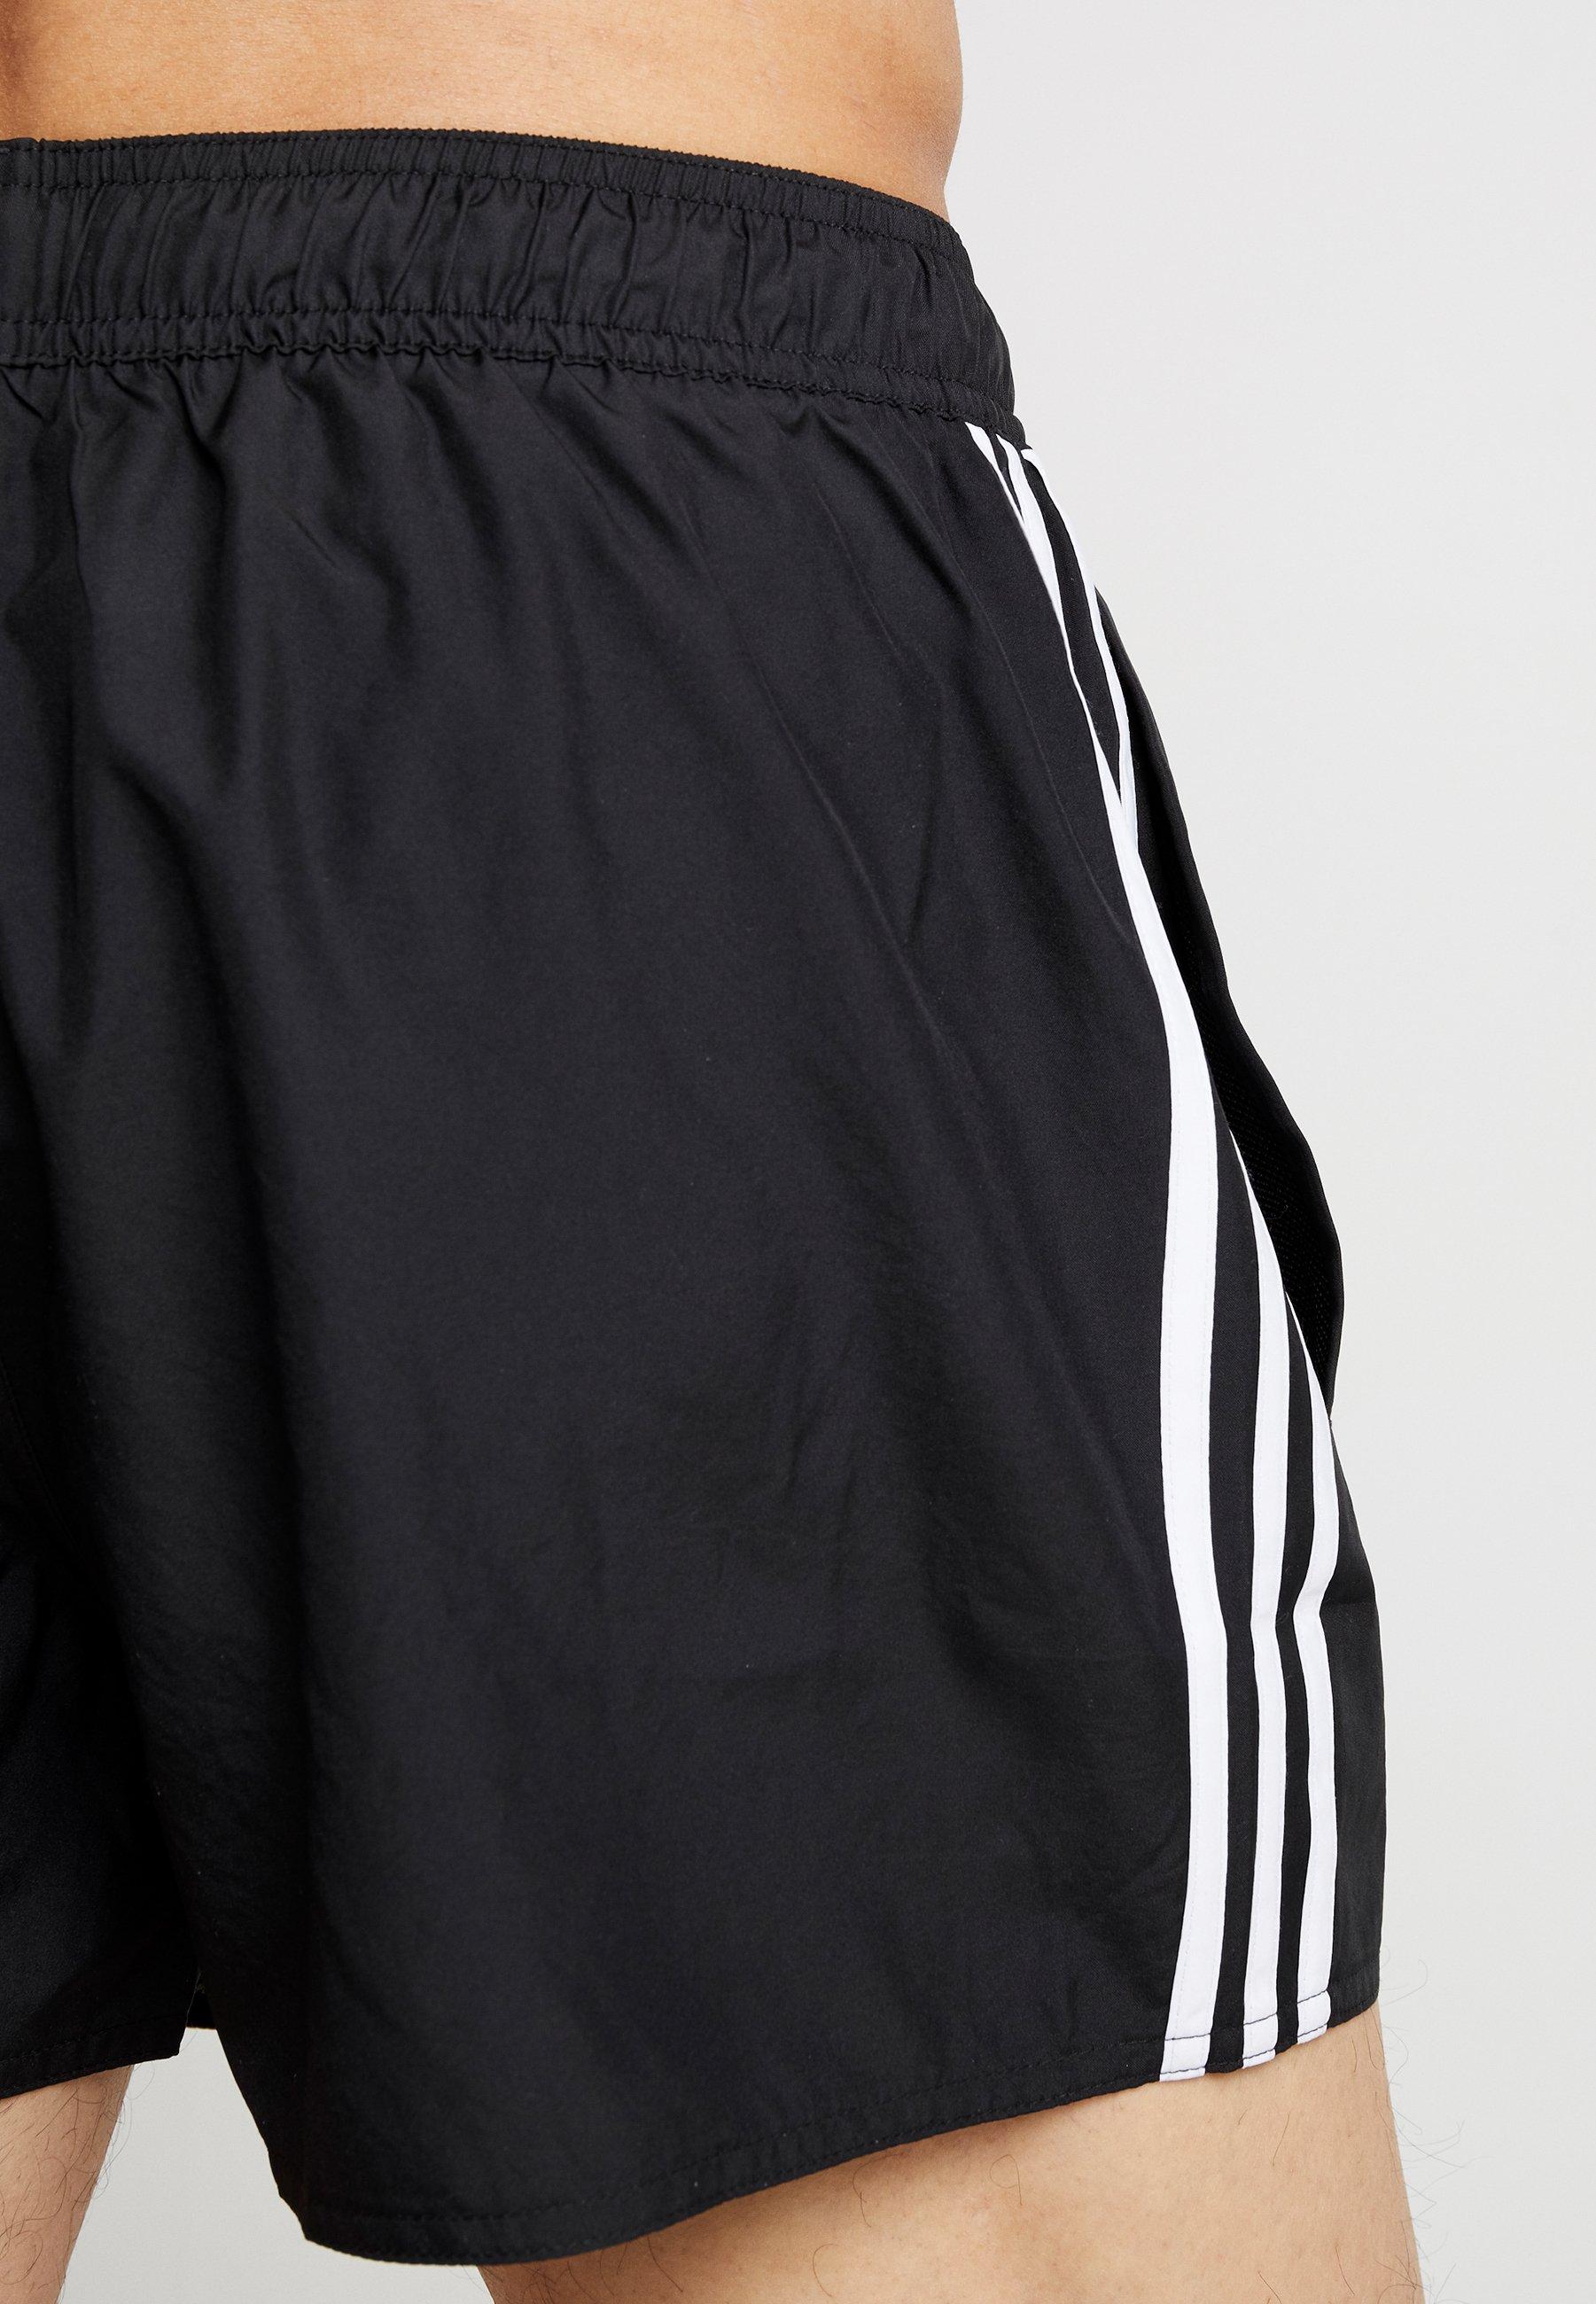 Adidas Performance Badeshorts - Black